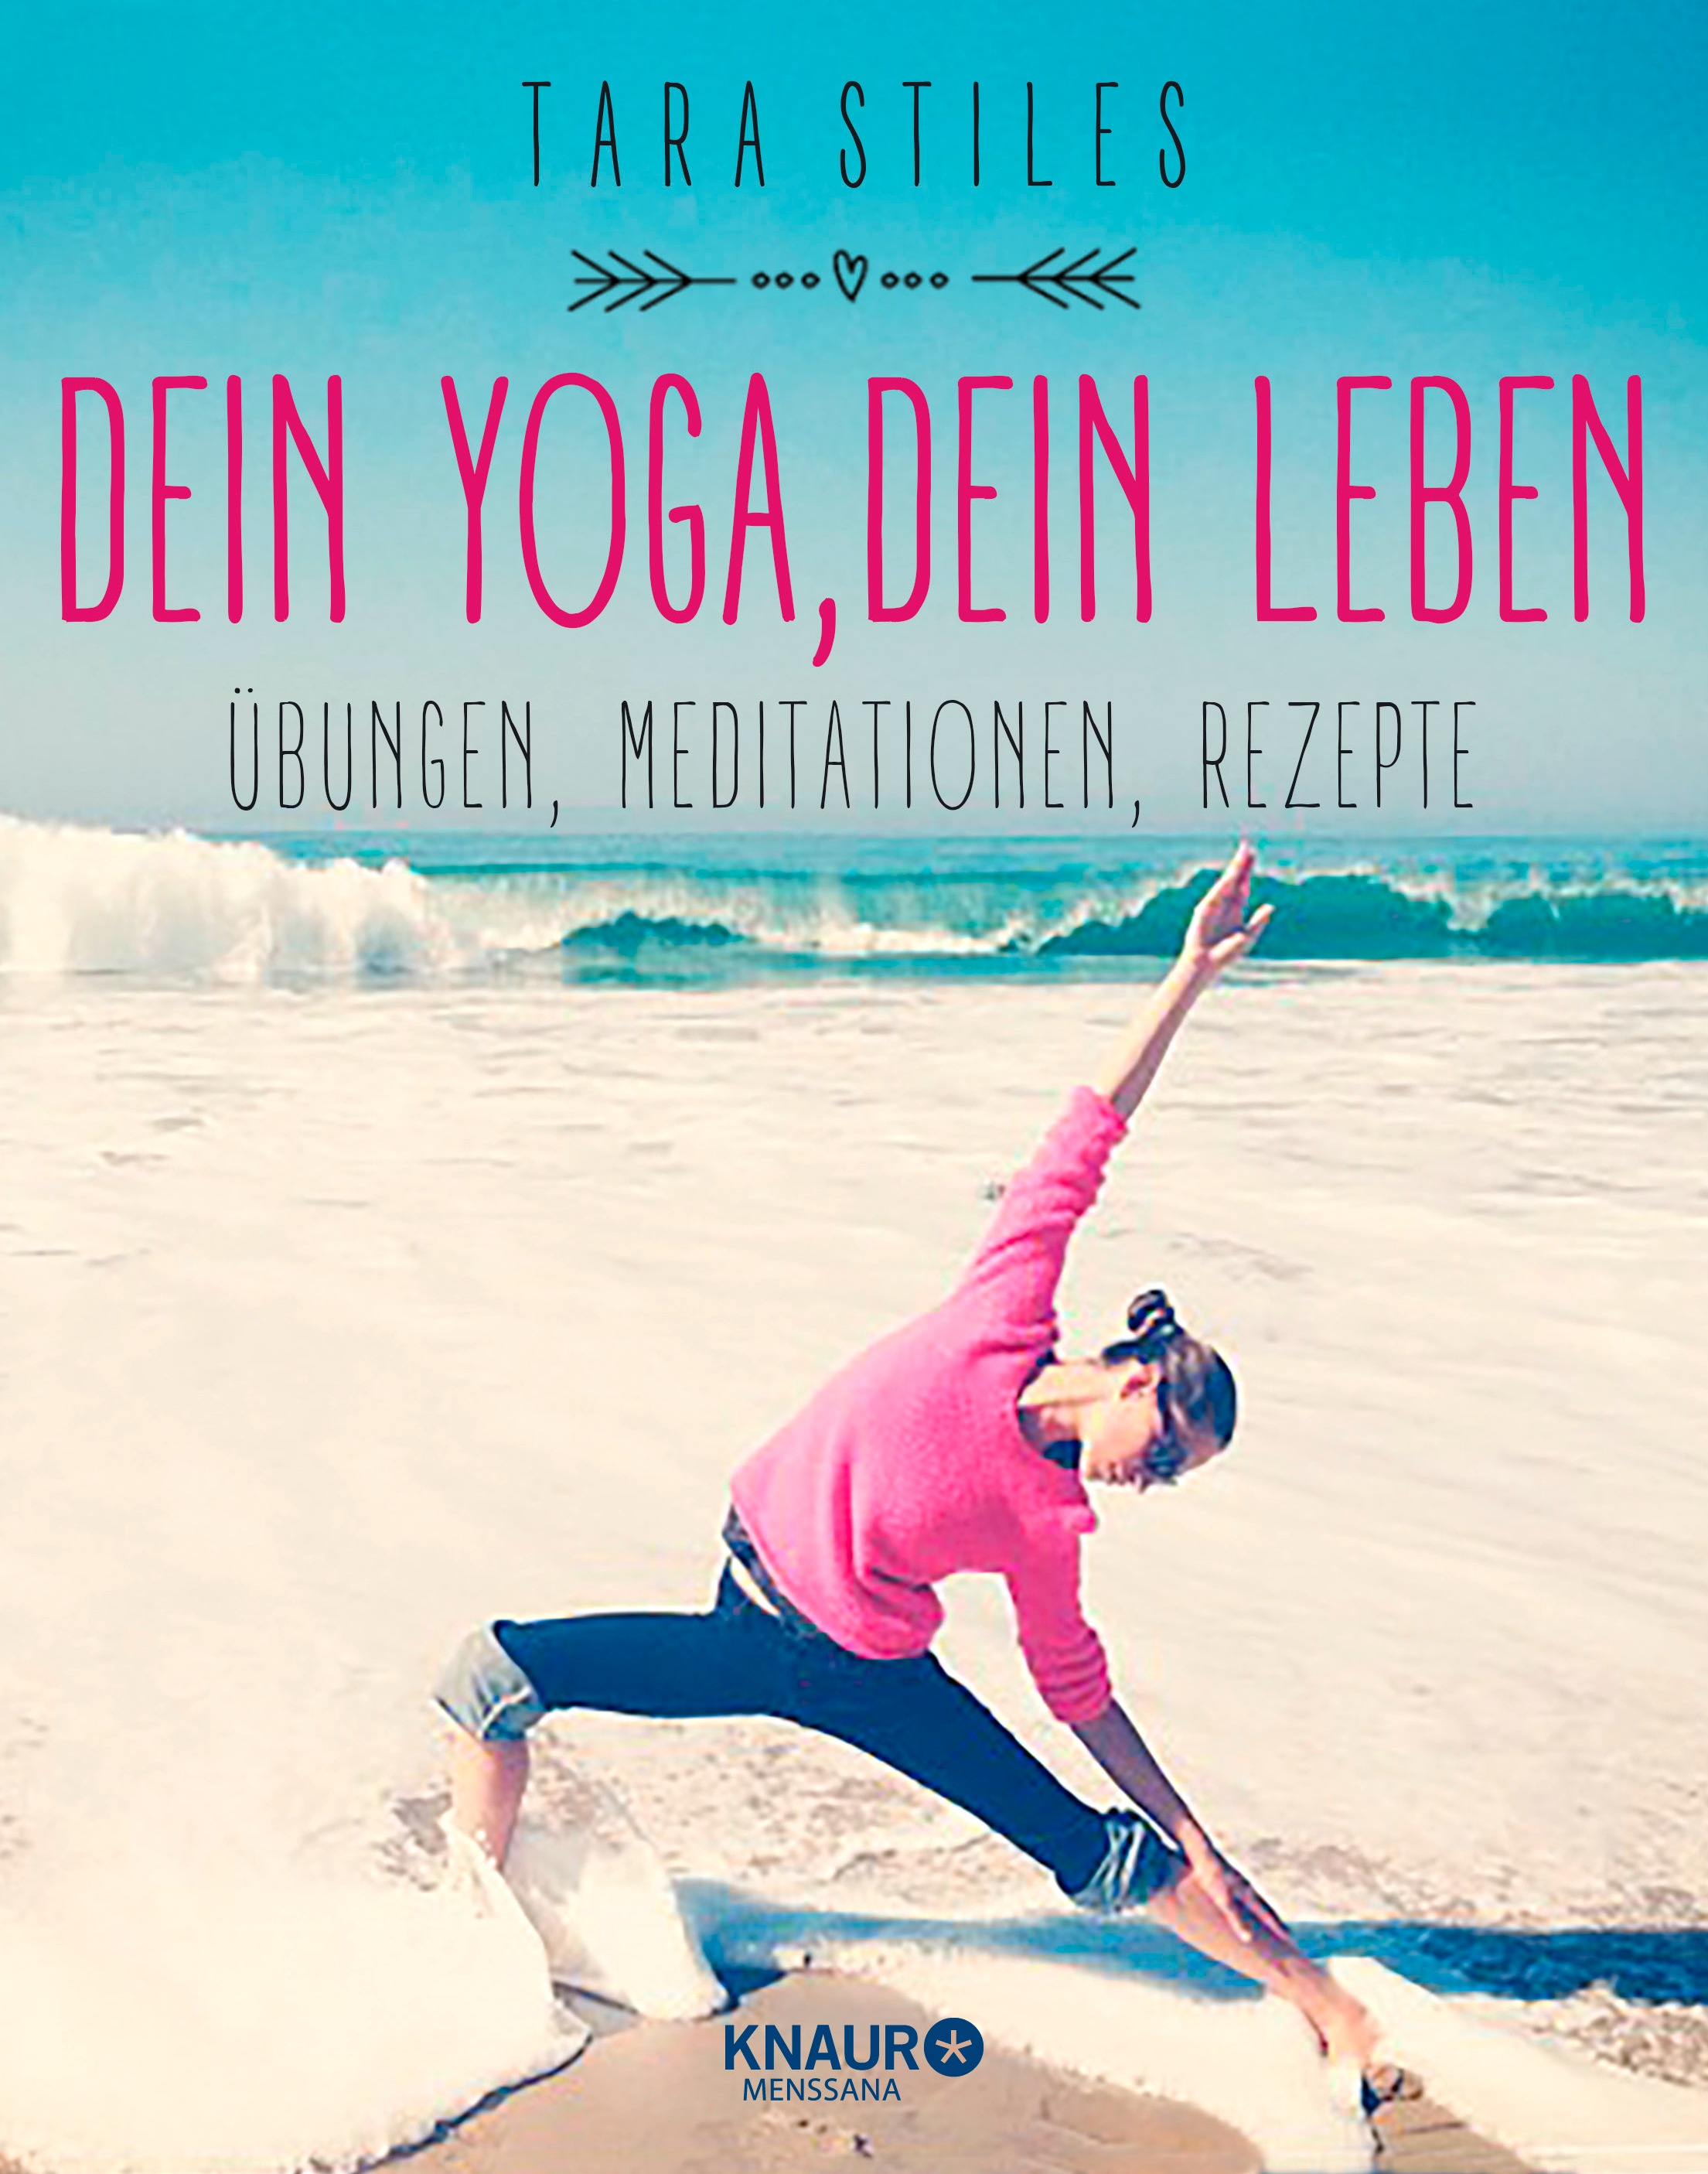 Tara Stiles, Dein Yoga, Dein Leben, Übungen, Rezepte, Meditationen